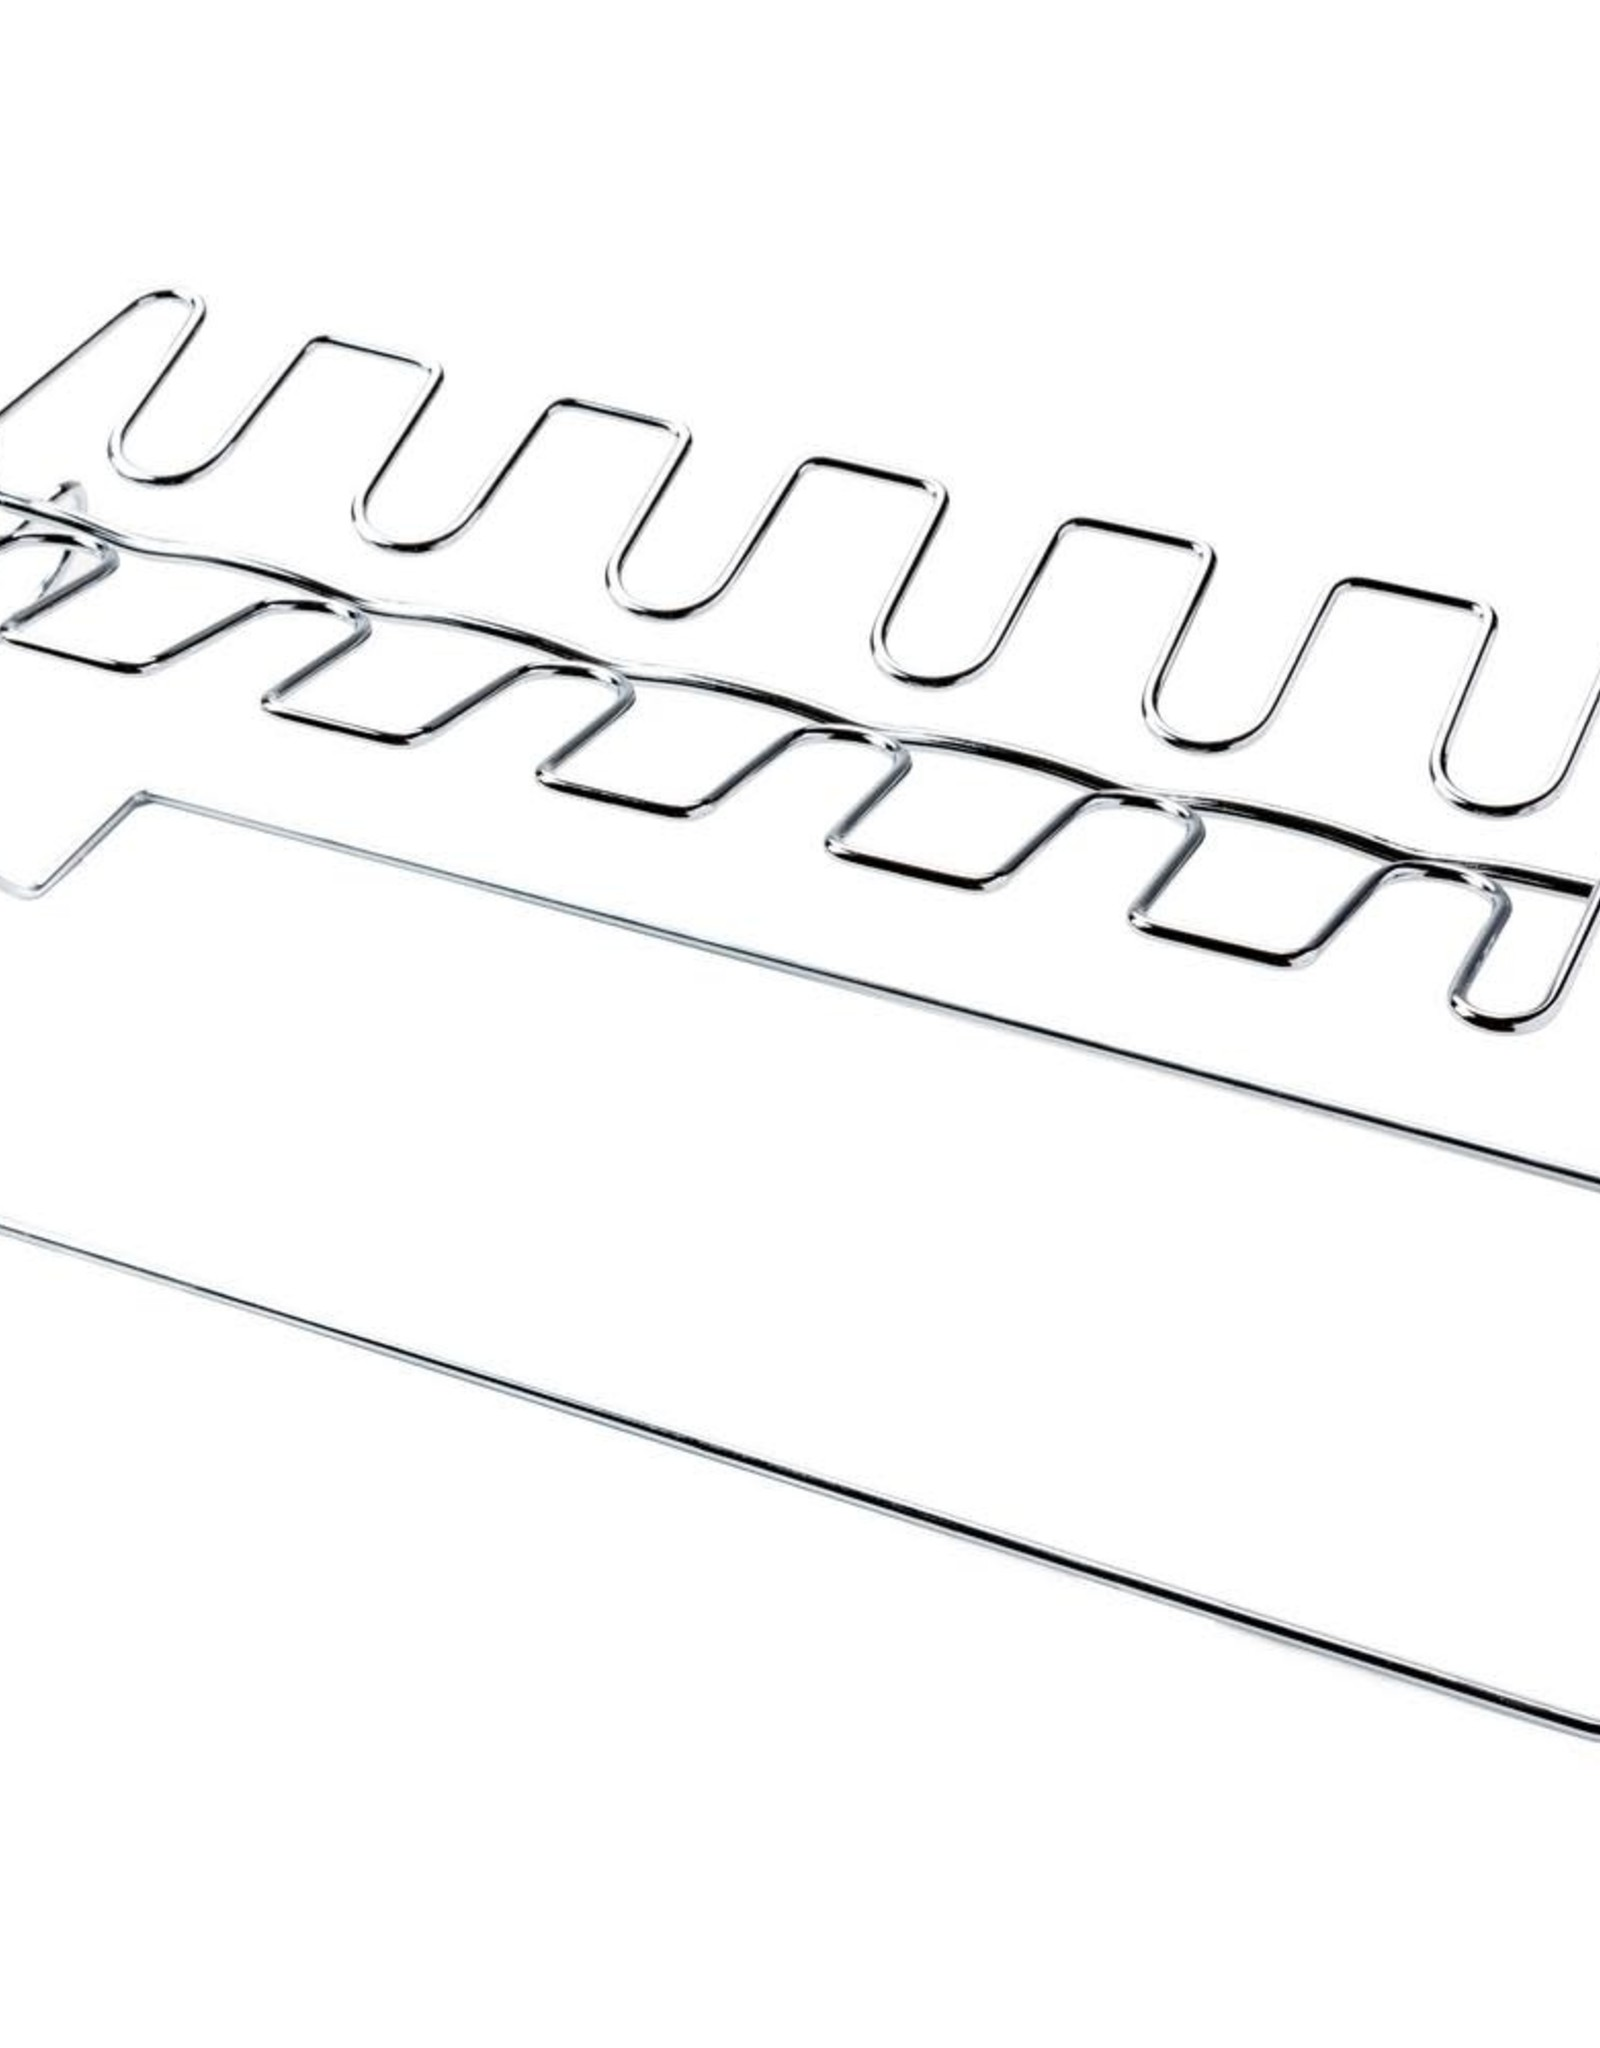 Traeger Traeger Leg & Wing Rack - BAC326